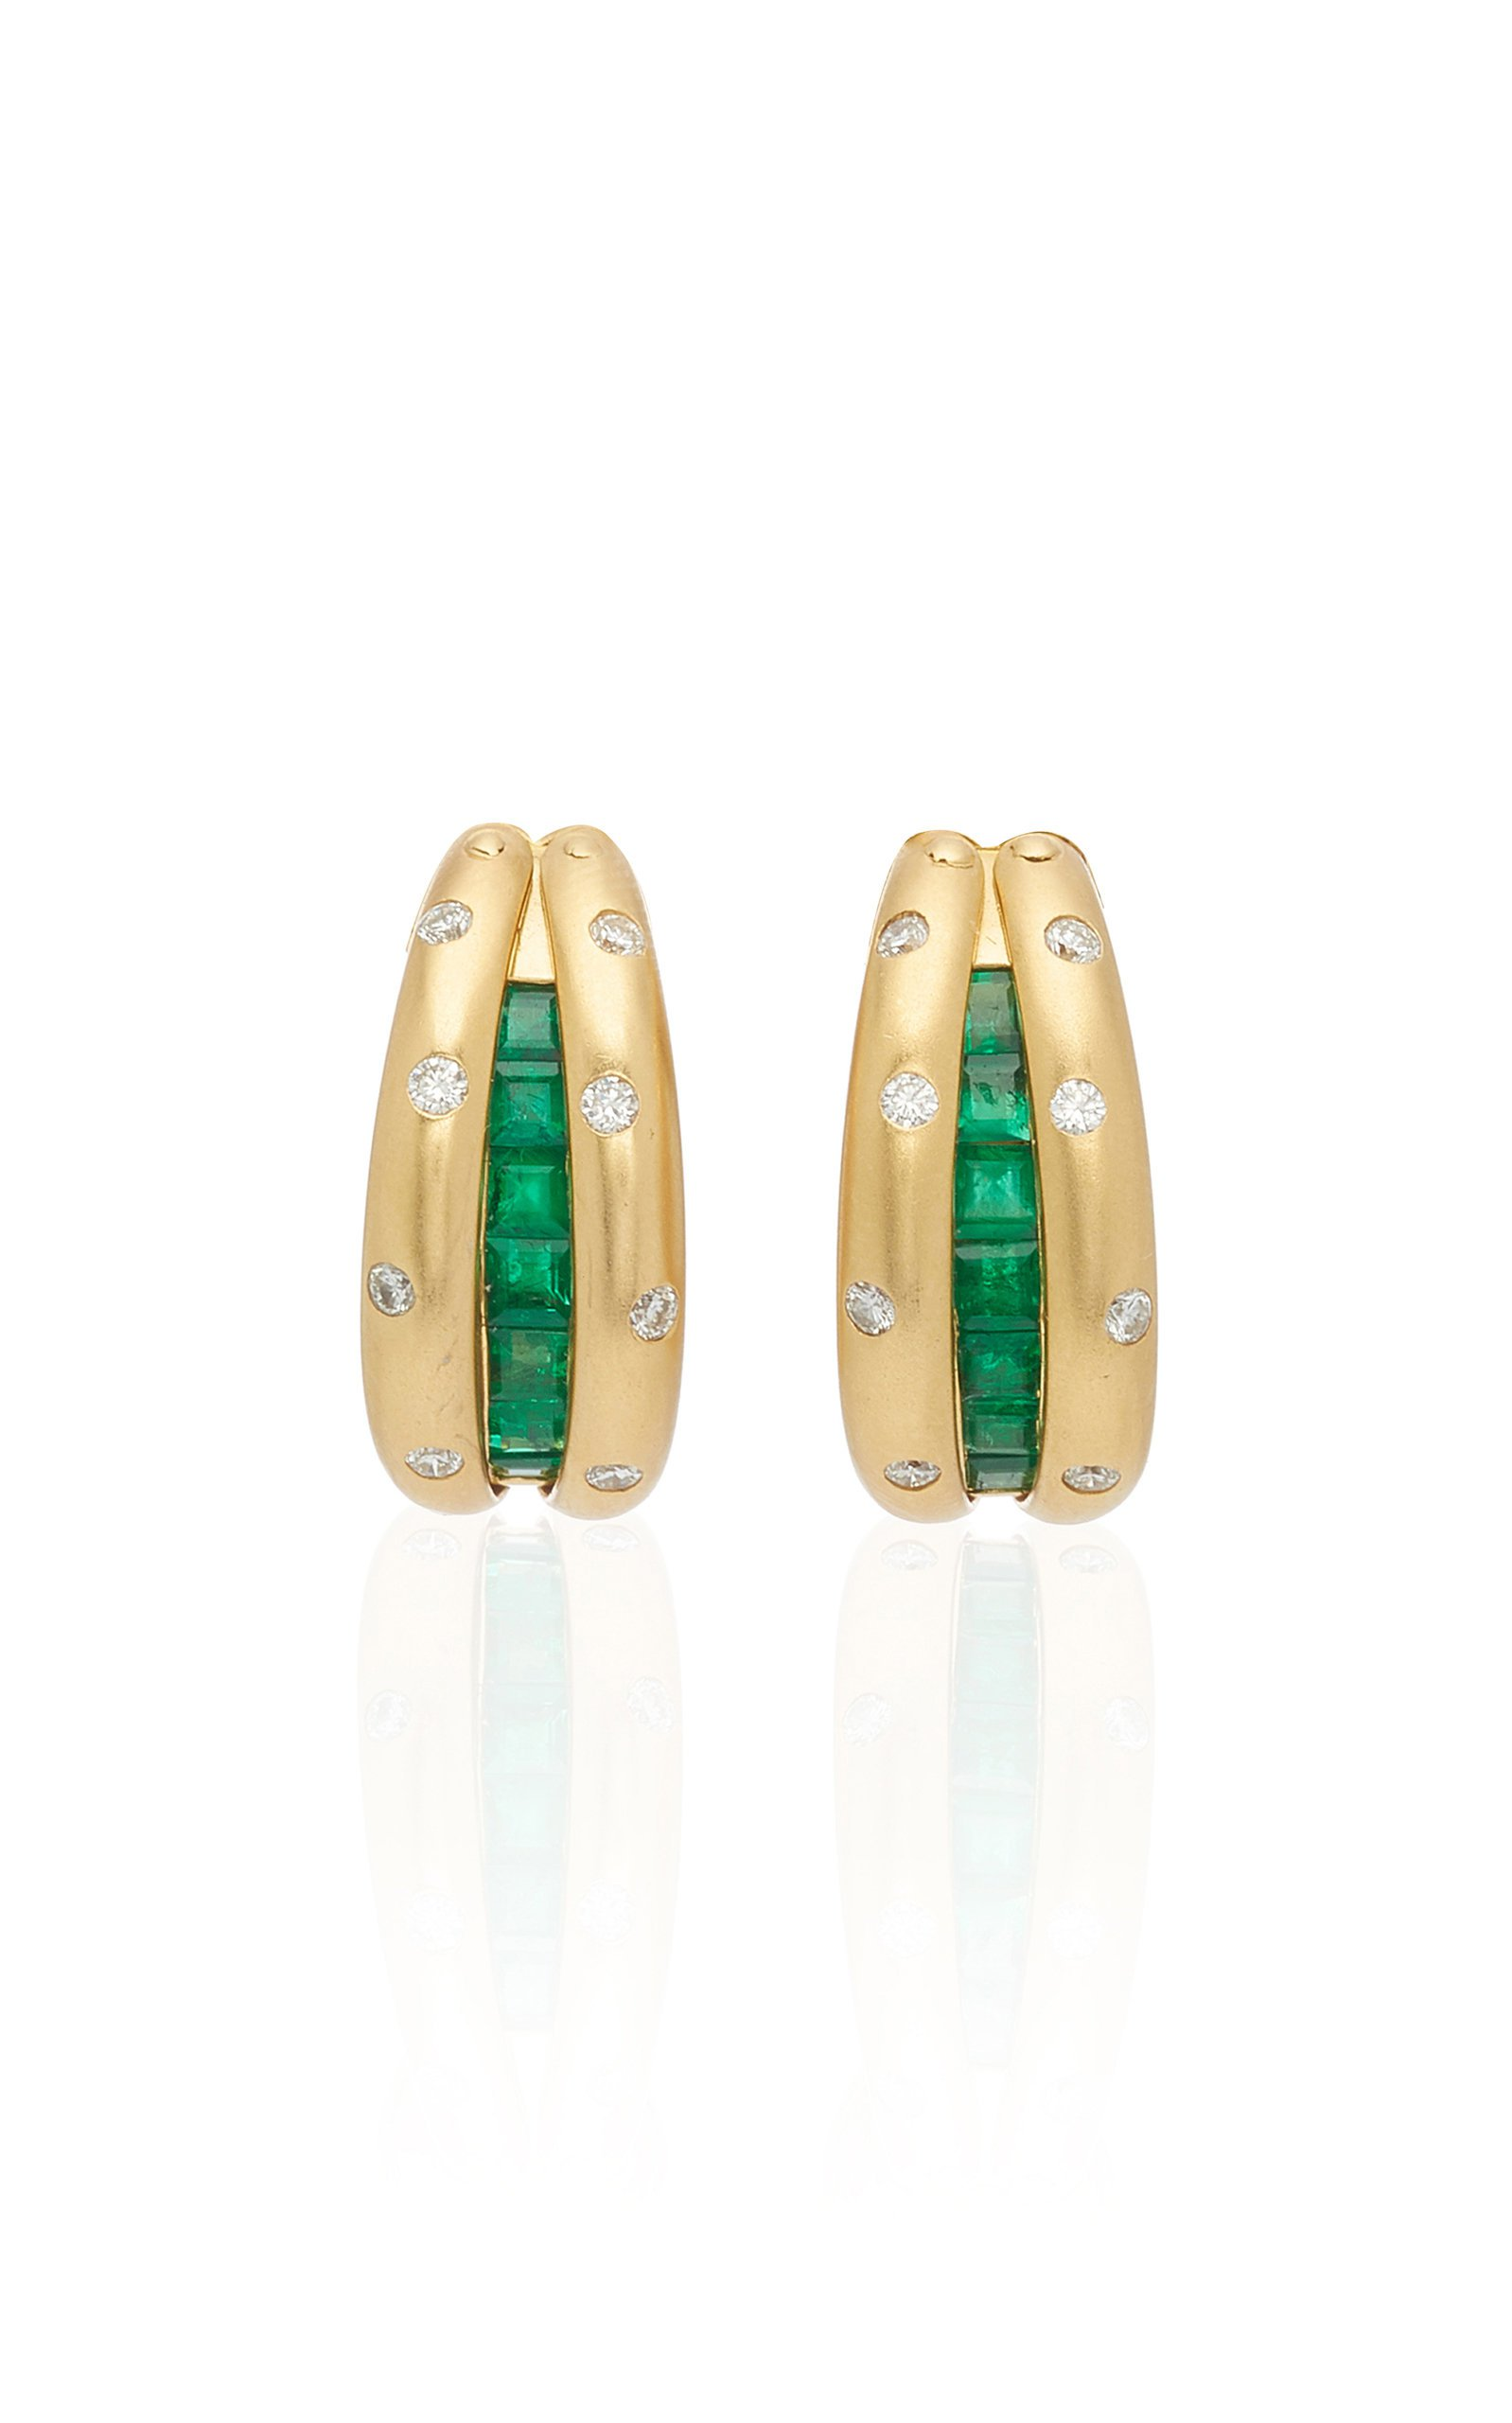 Eleuteri Parure Of 18K Gold Earrings Bracelet And Ring